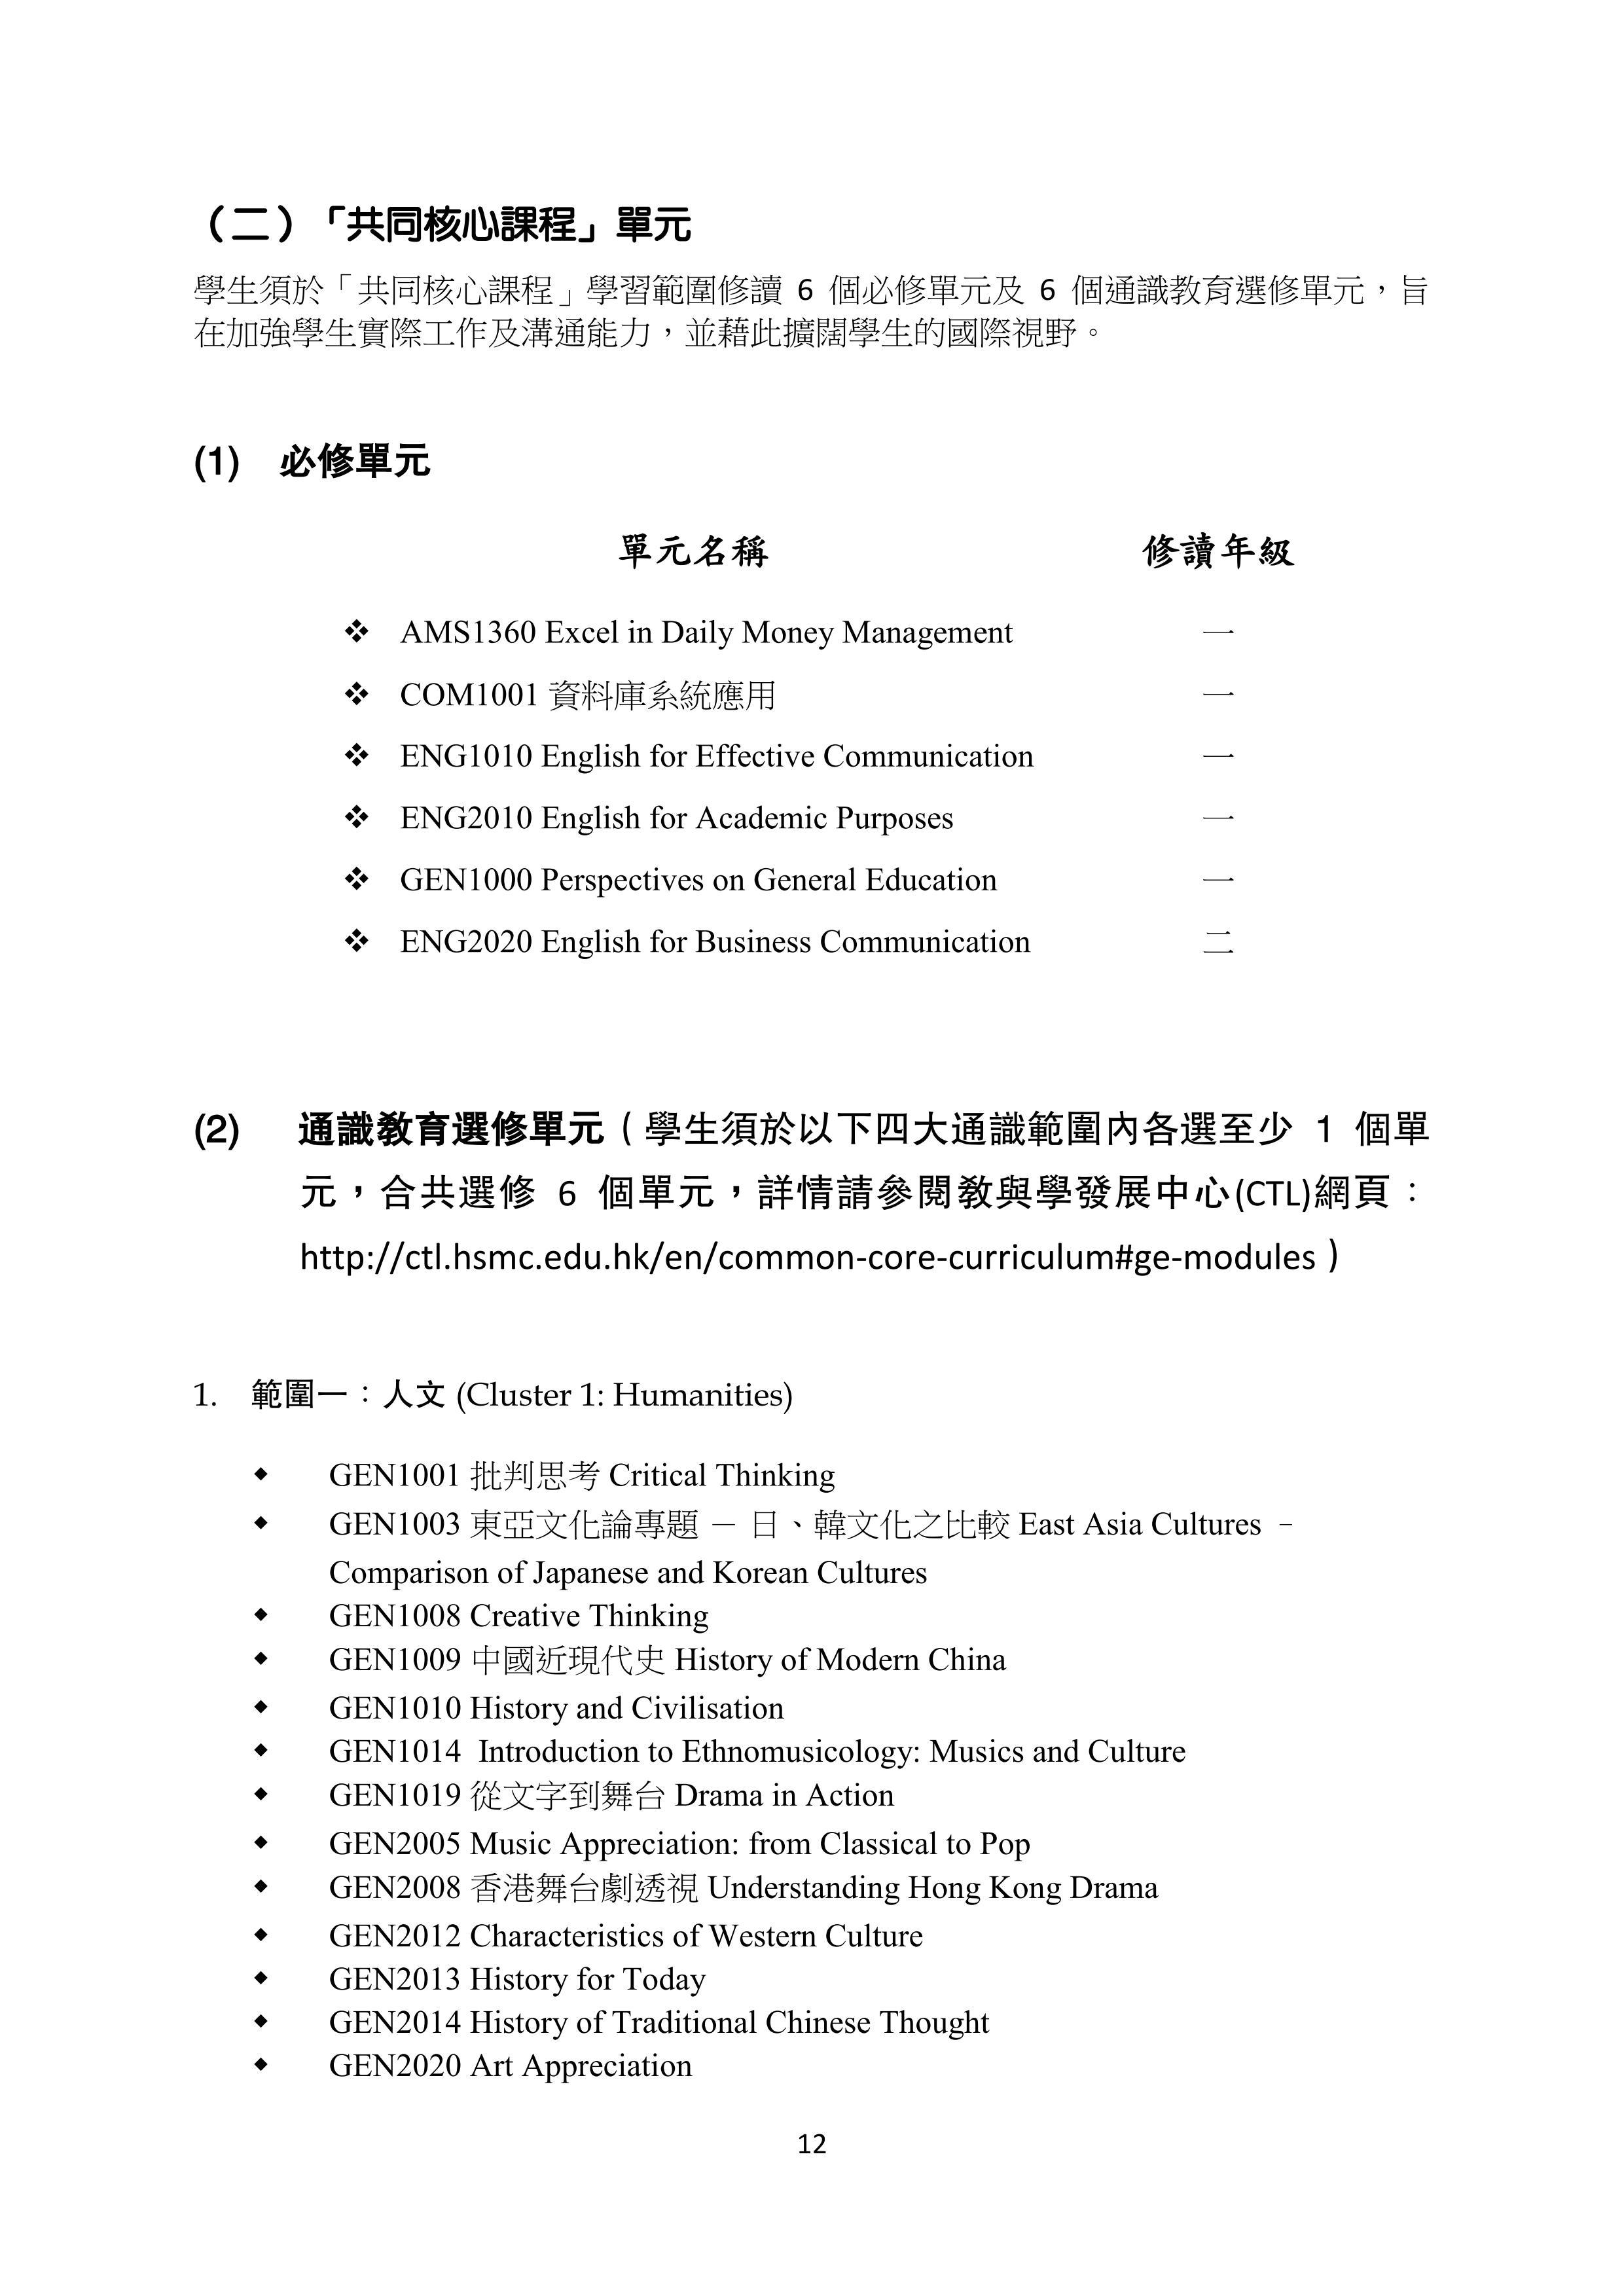 BA-CHI Programme Handbook-2018-19_14